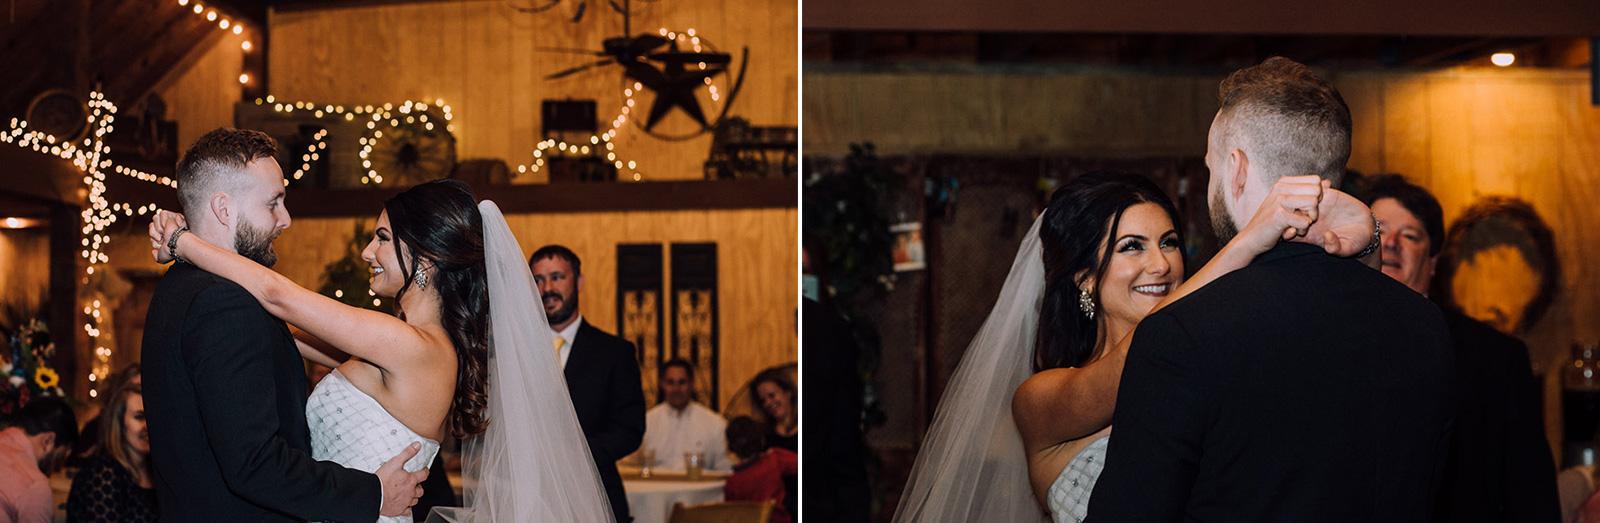 atlanta wedding photographers elopement photographer engagement photography hightower falls wedding venue_1038.jpg